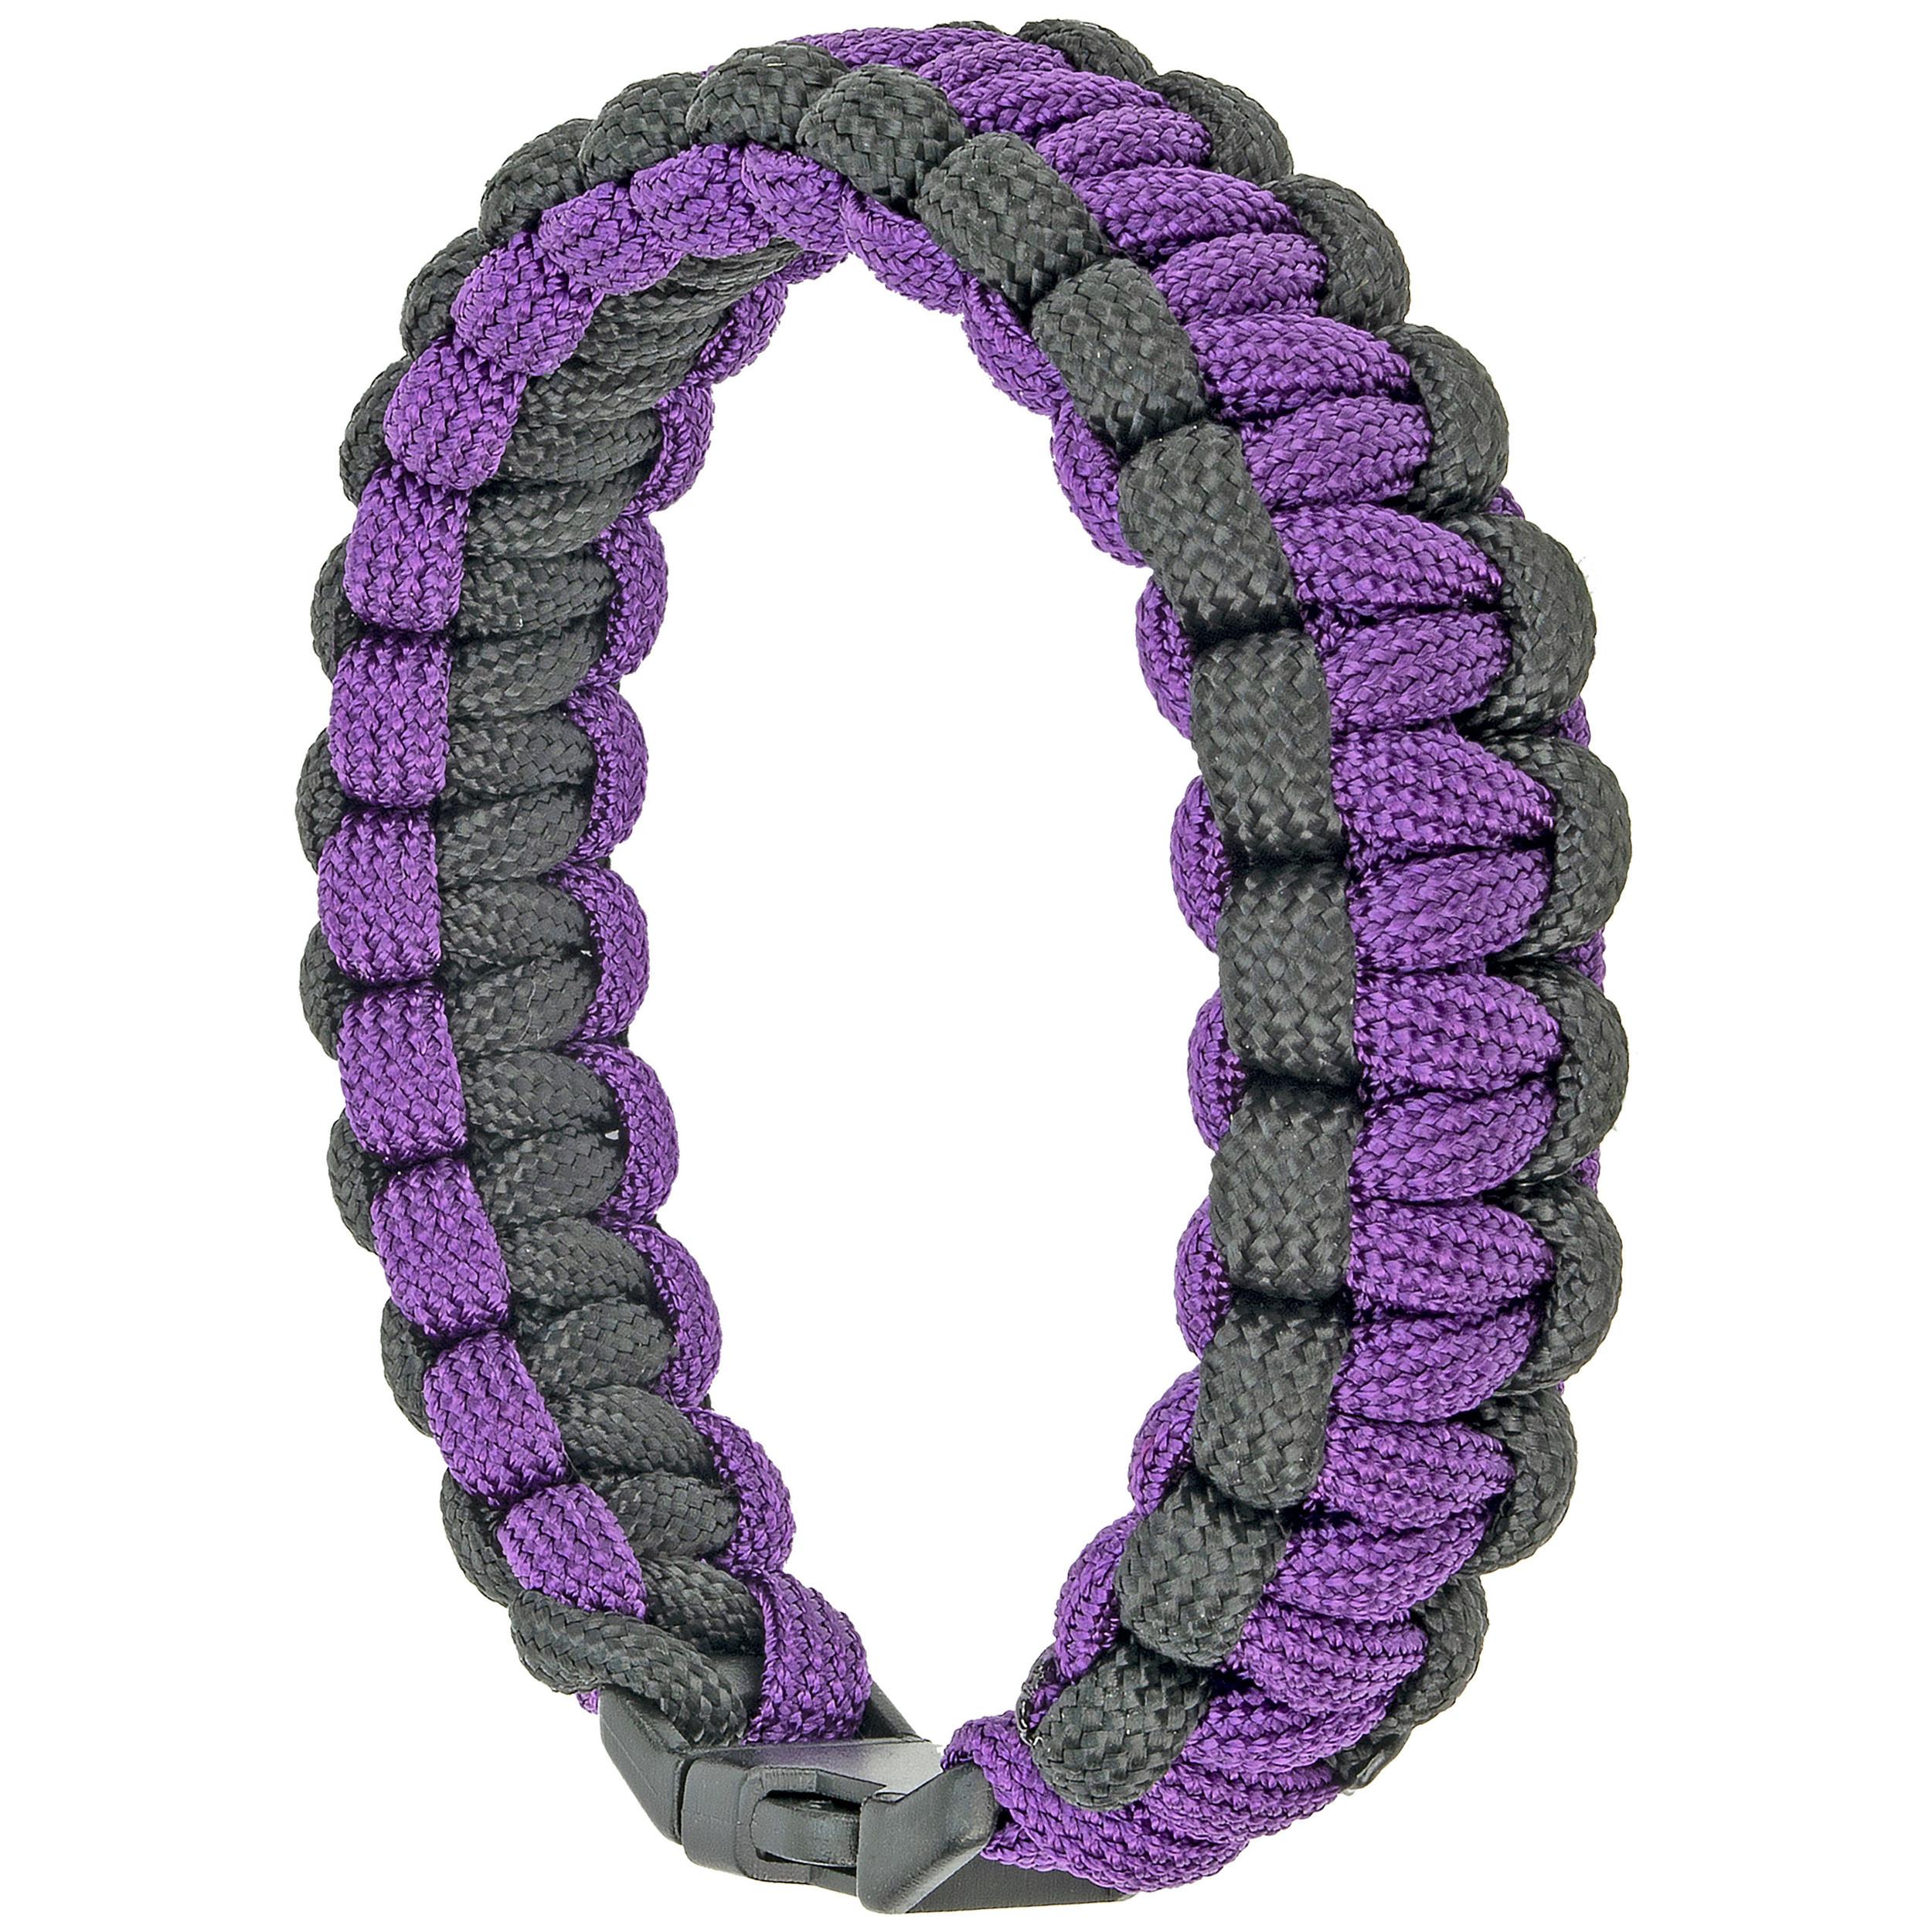 Southern Homewares Paracord Survival Bracelet, 8-Inch, Purple and Black